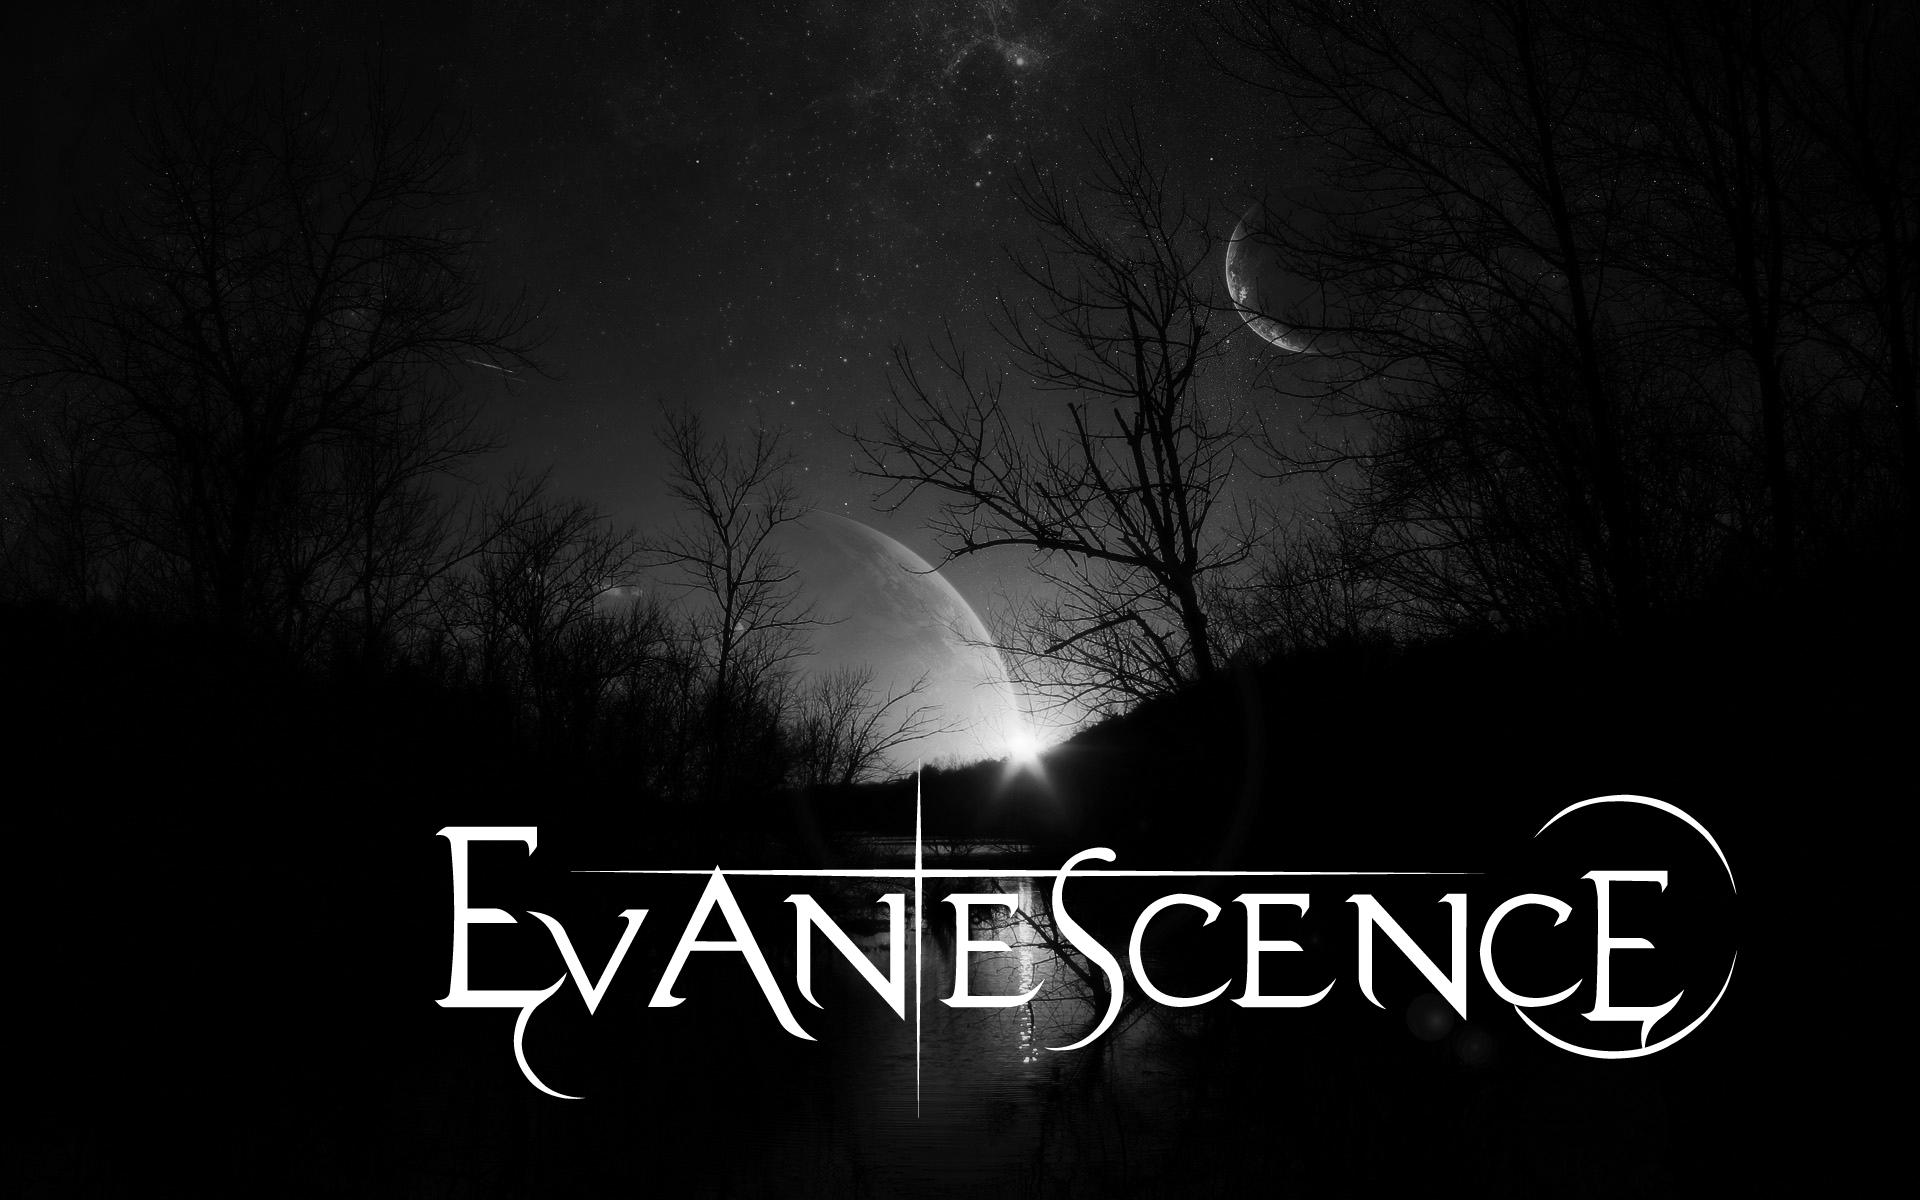 75 Evanescence Wallpaper On Wallpapersafari